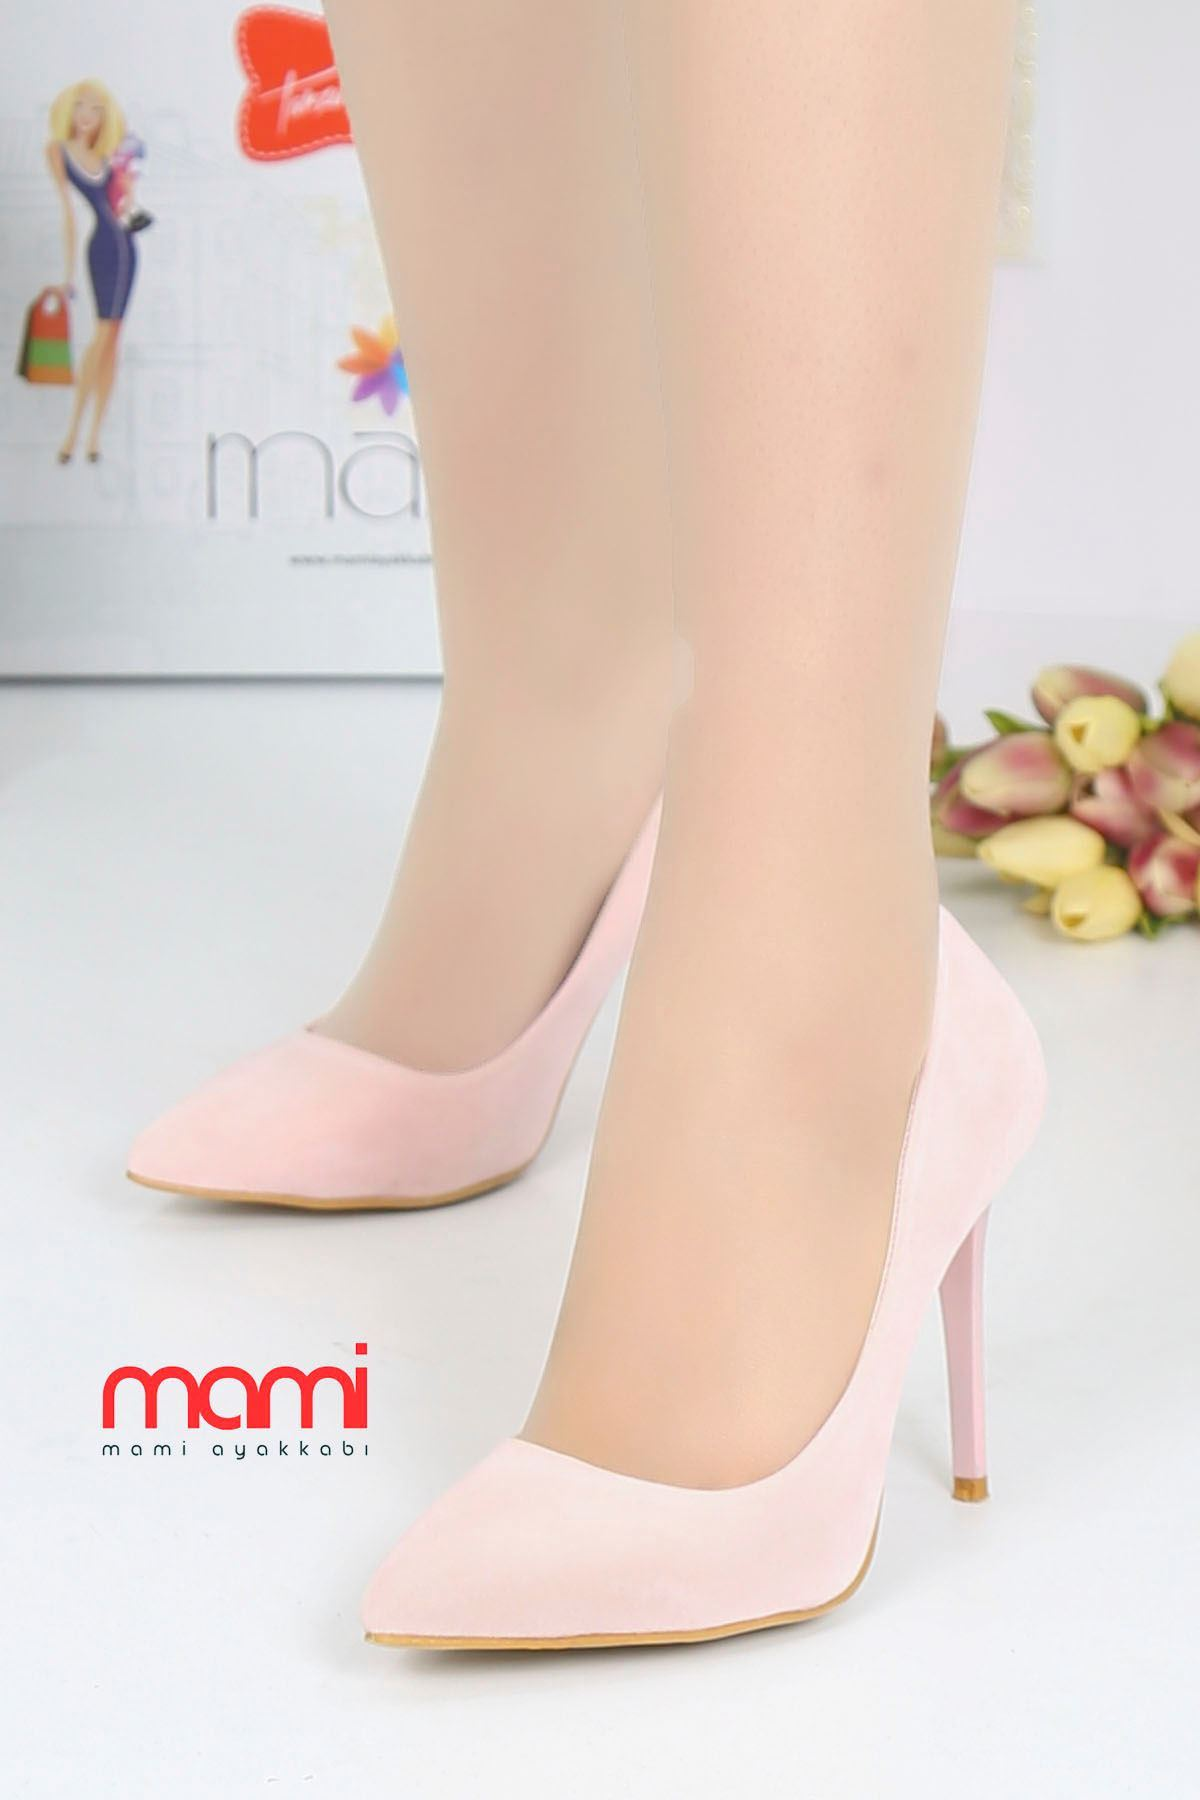 Mami- Stiletto Ayakkabı Pudra Süet